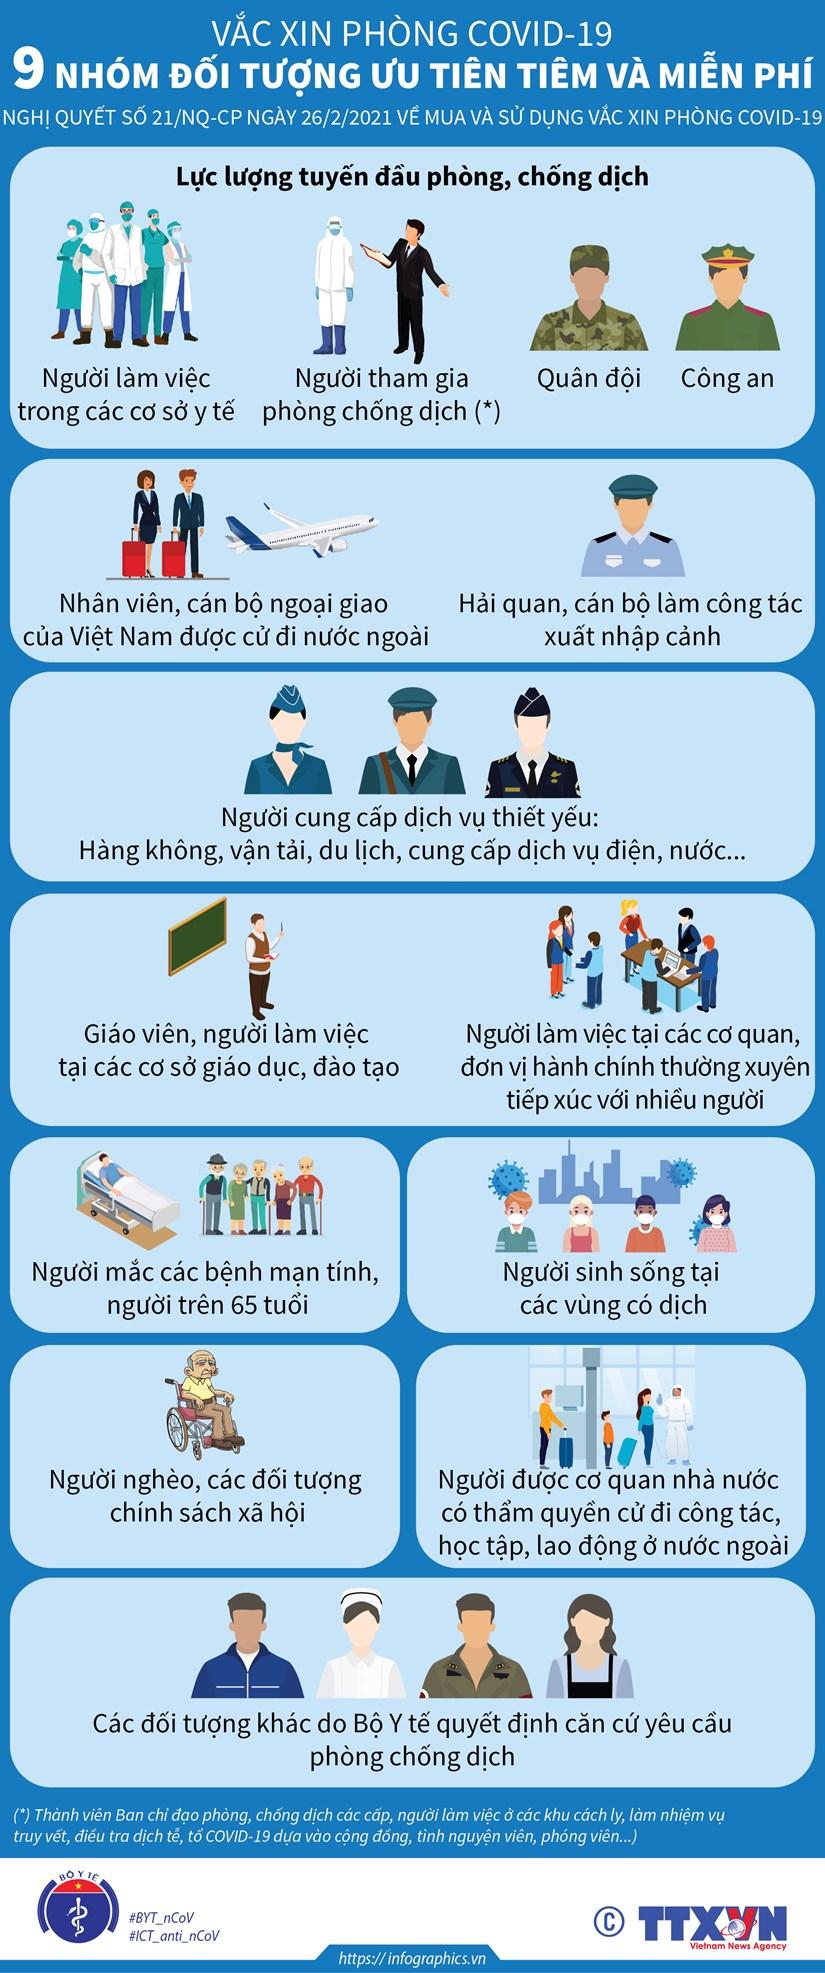 [Infographics] Chin nhom doi tuong uu tien va mien phi tiem vacxin hinh anh 1